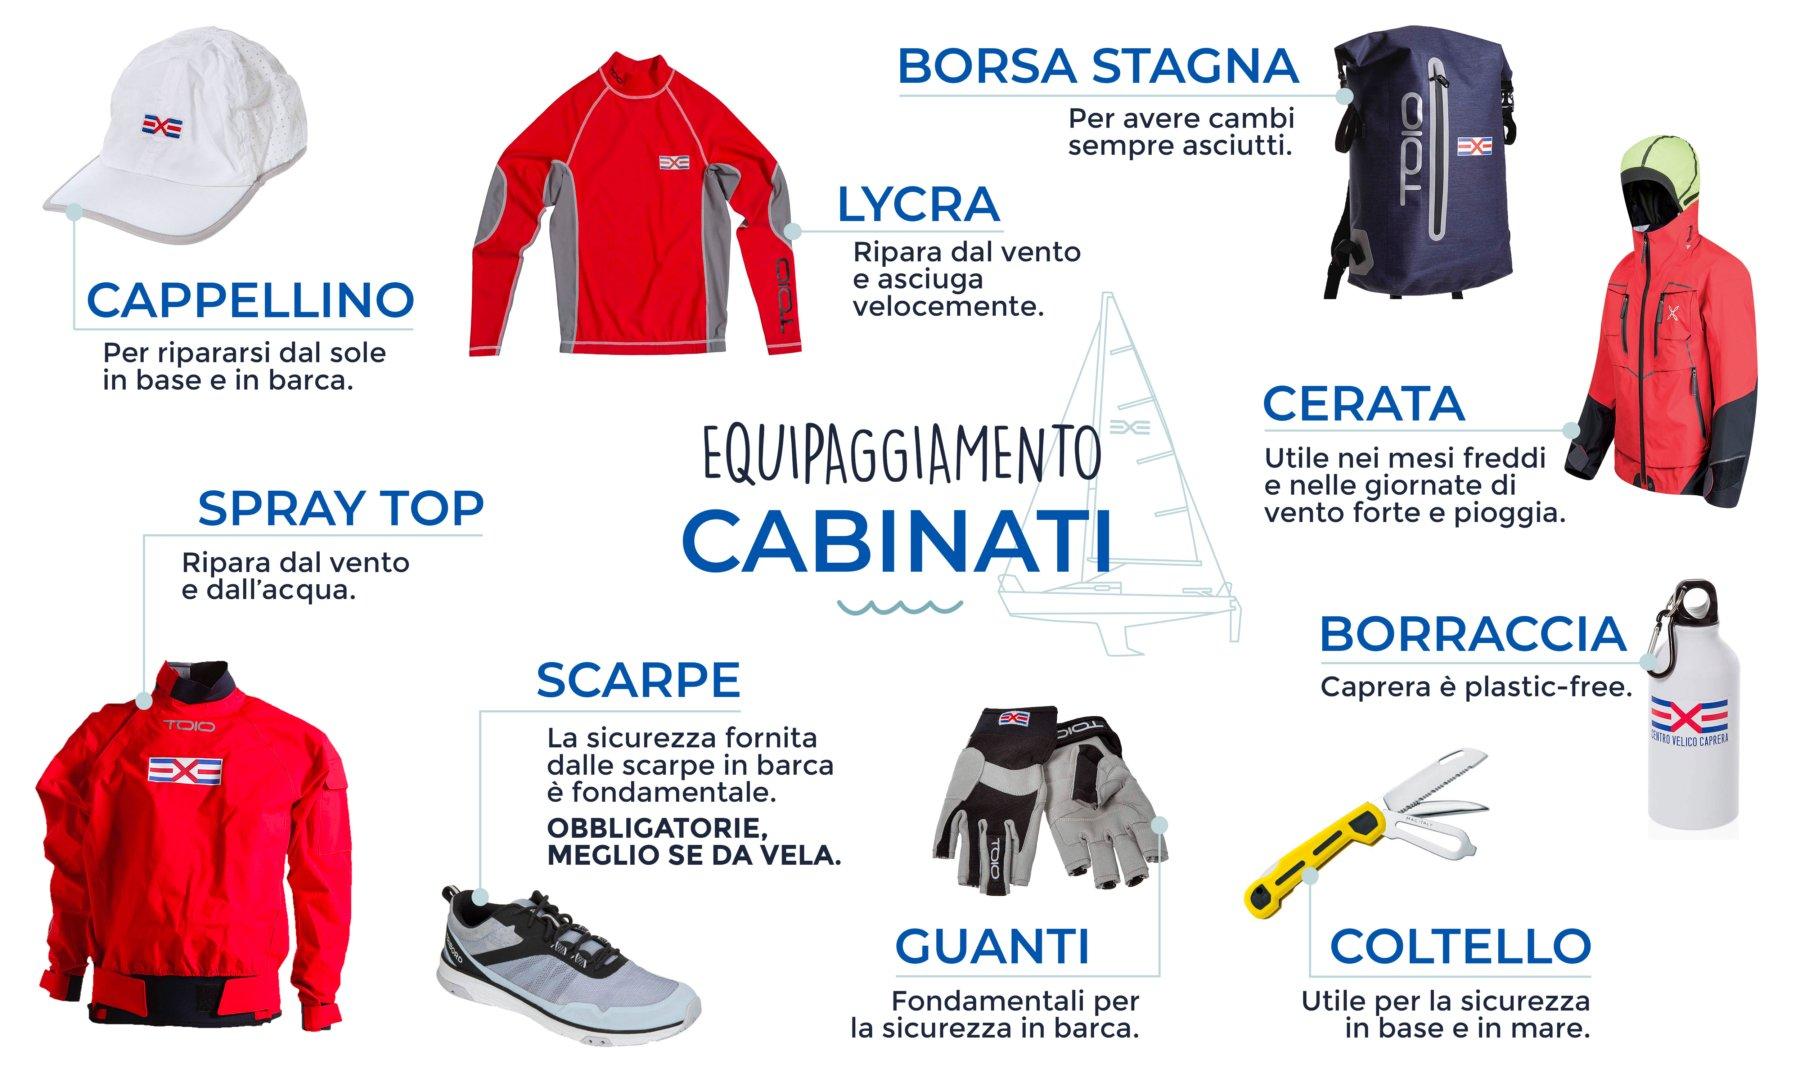 Essential Caprera Cabinati